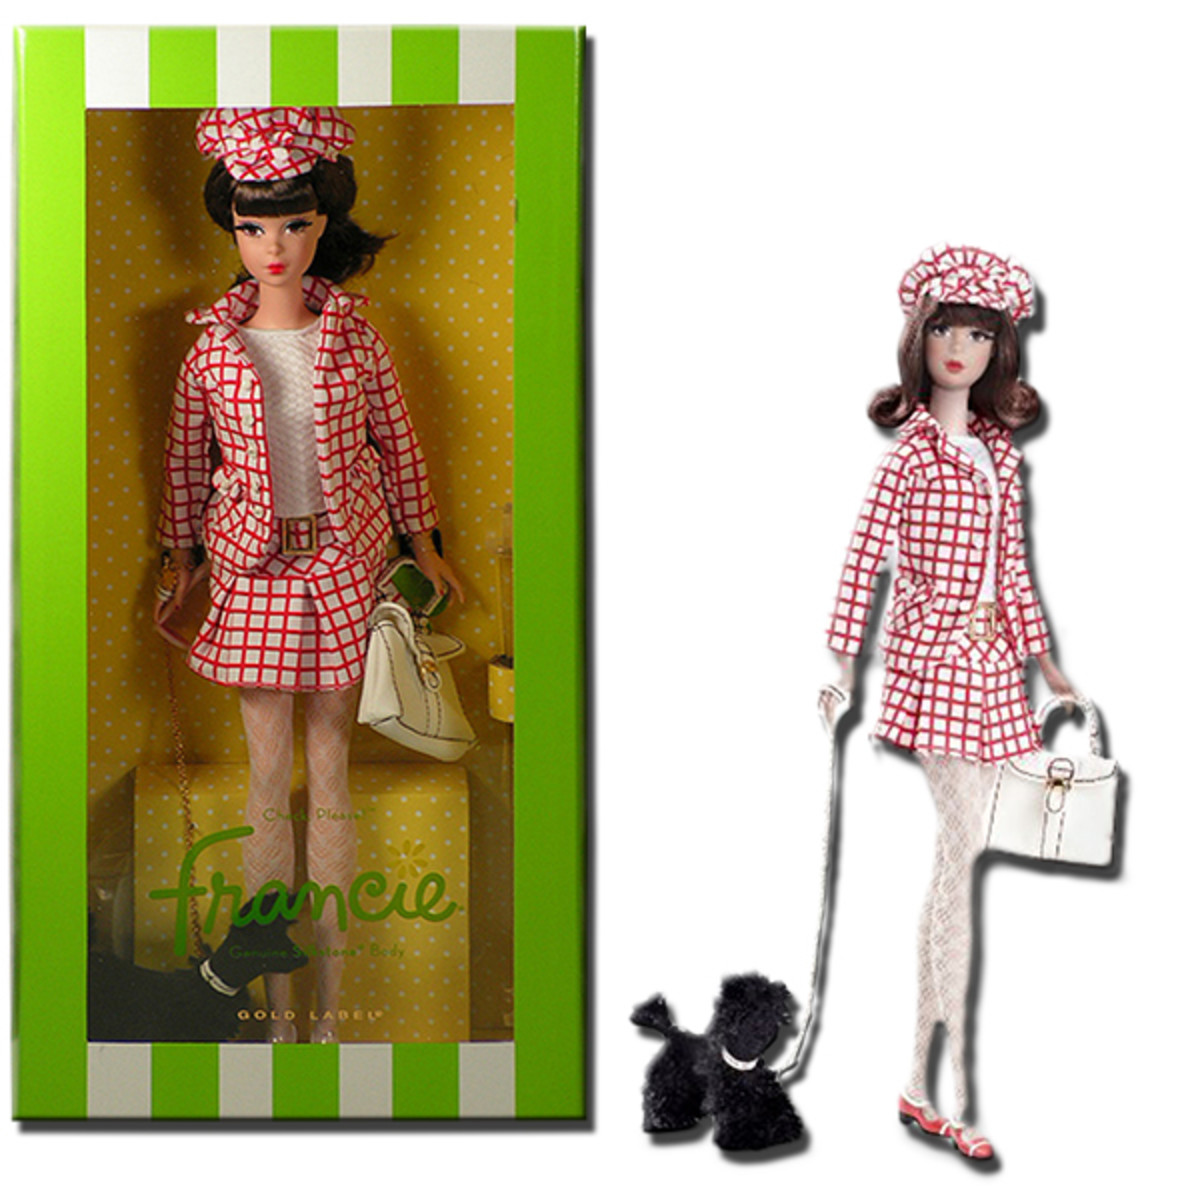 Barbie Gold Label Silkstone Francie doll